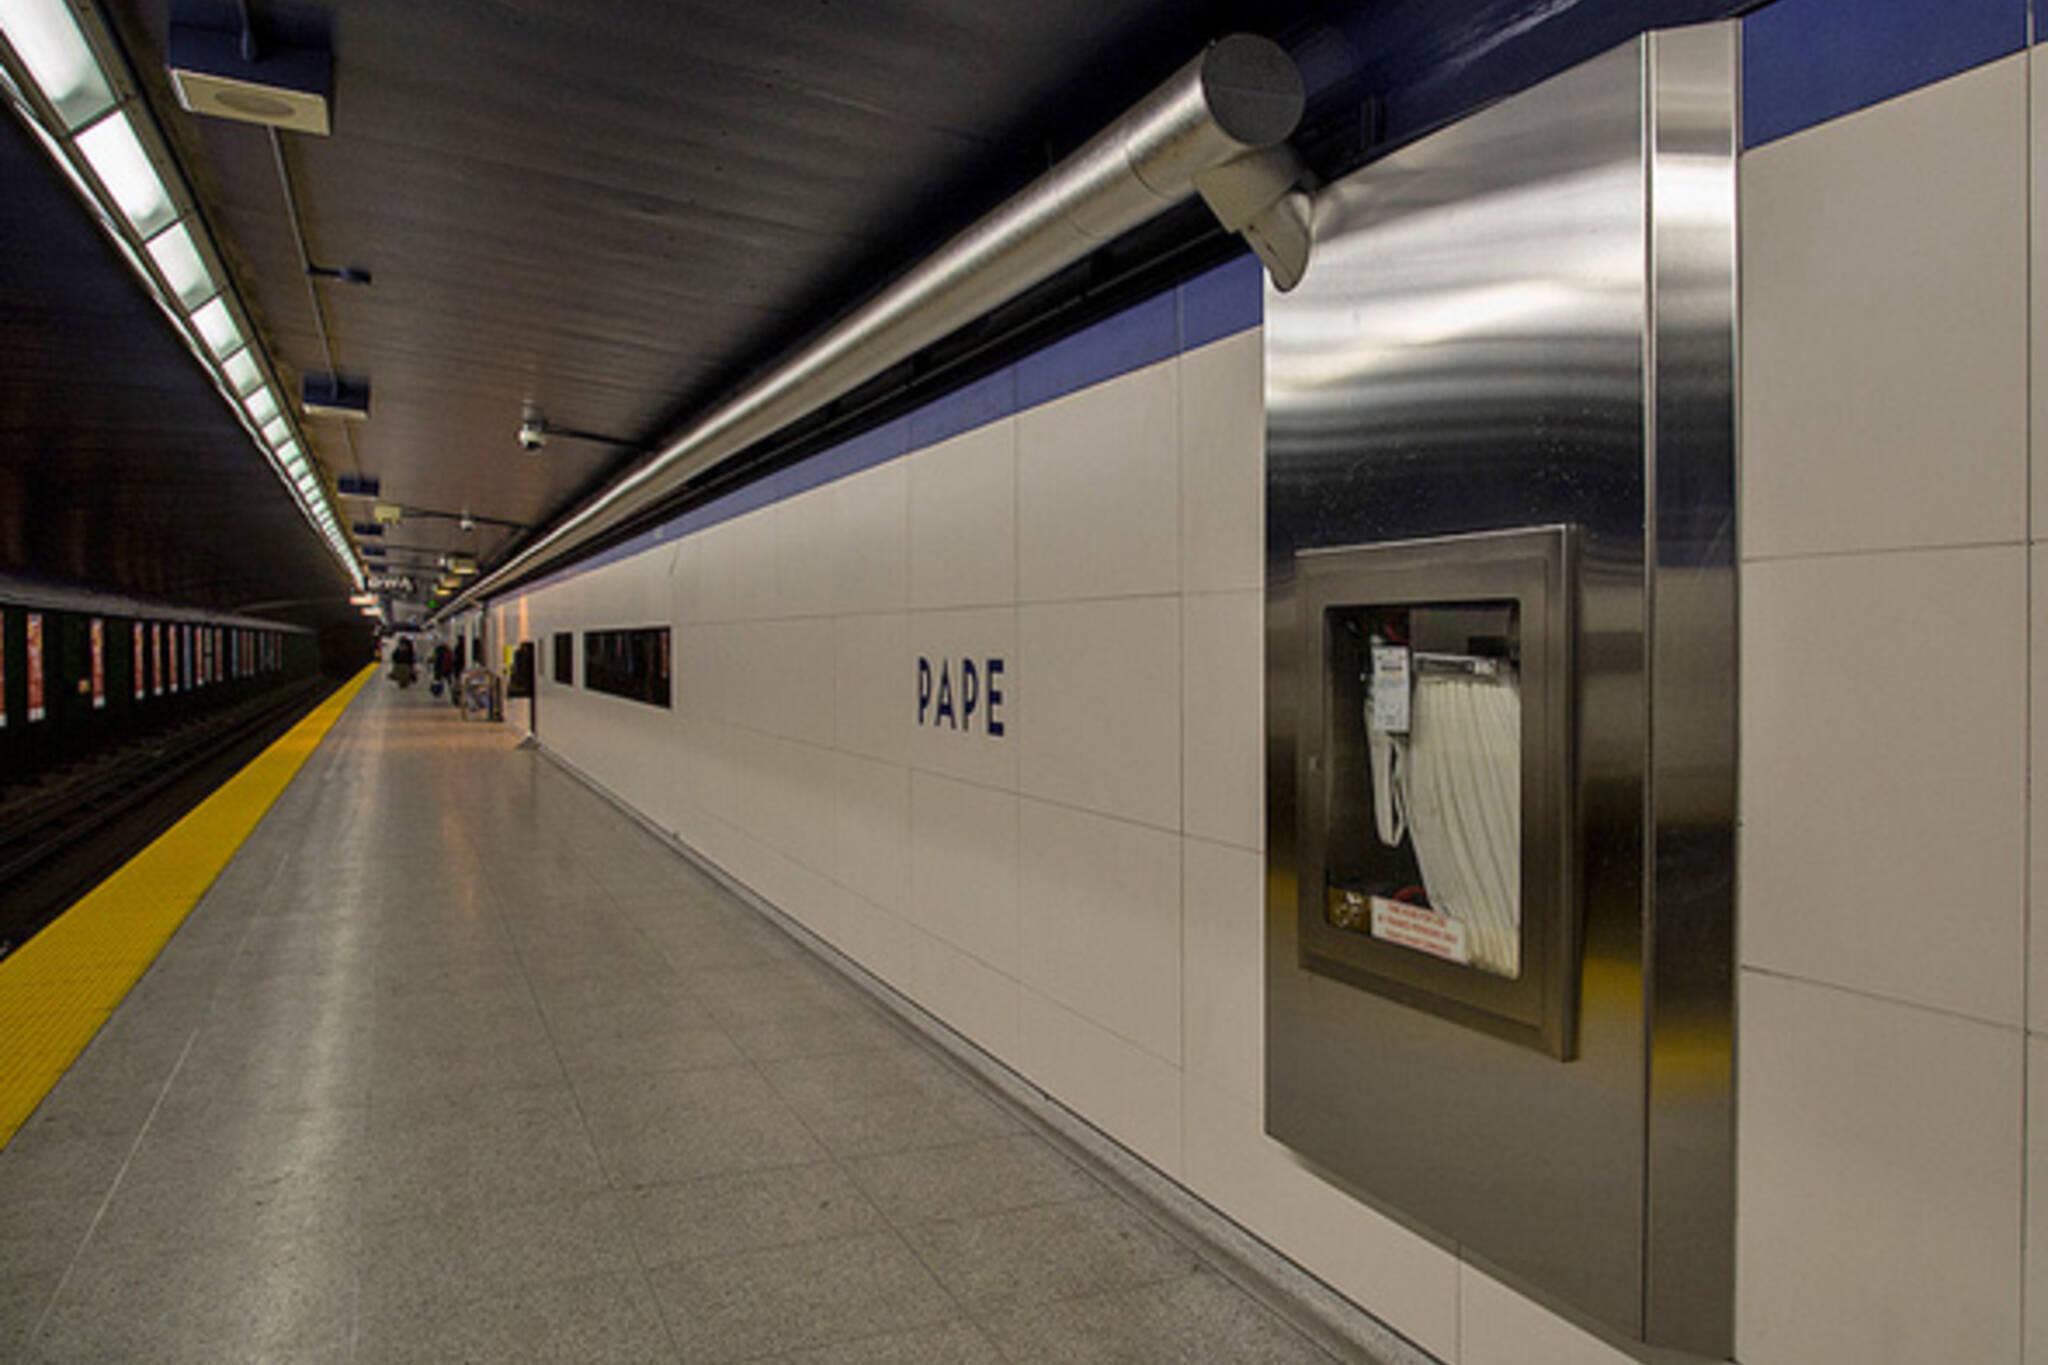 Pape Station Toronto